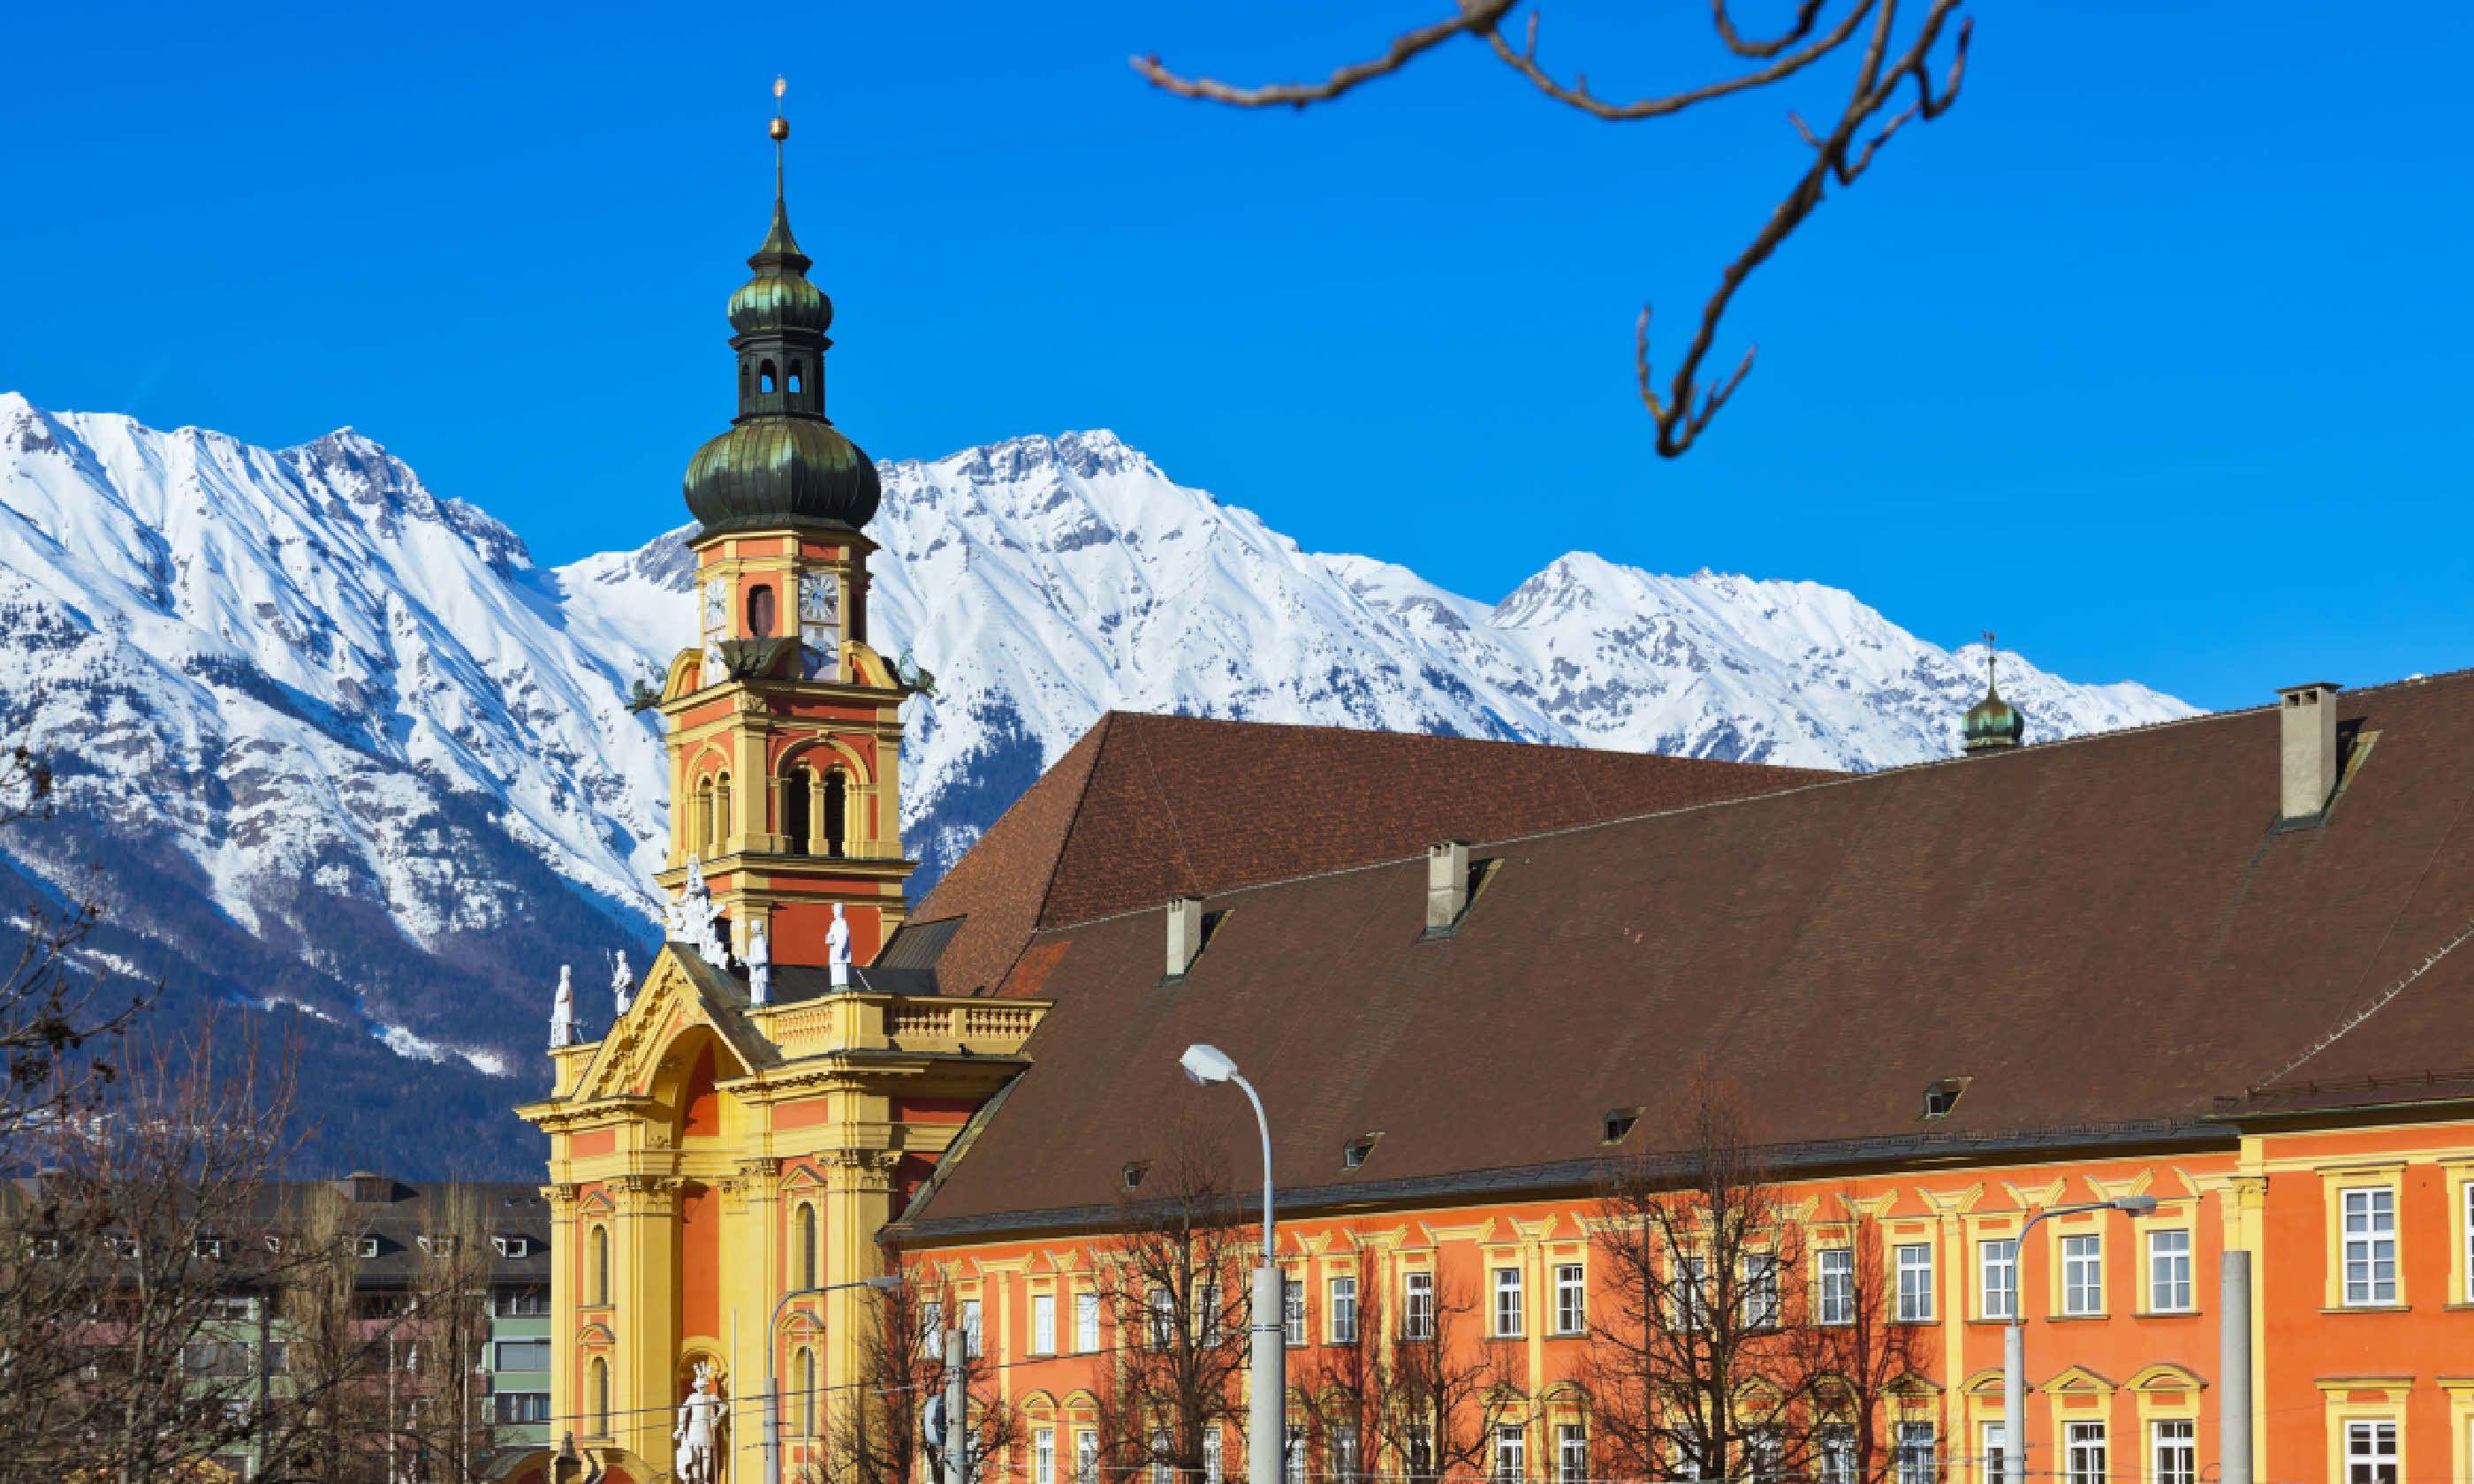 Old cathedral in Innsbruck Austria (Shutterstock)